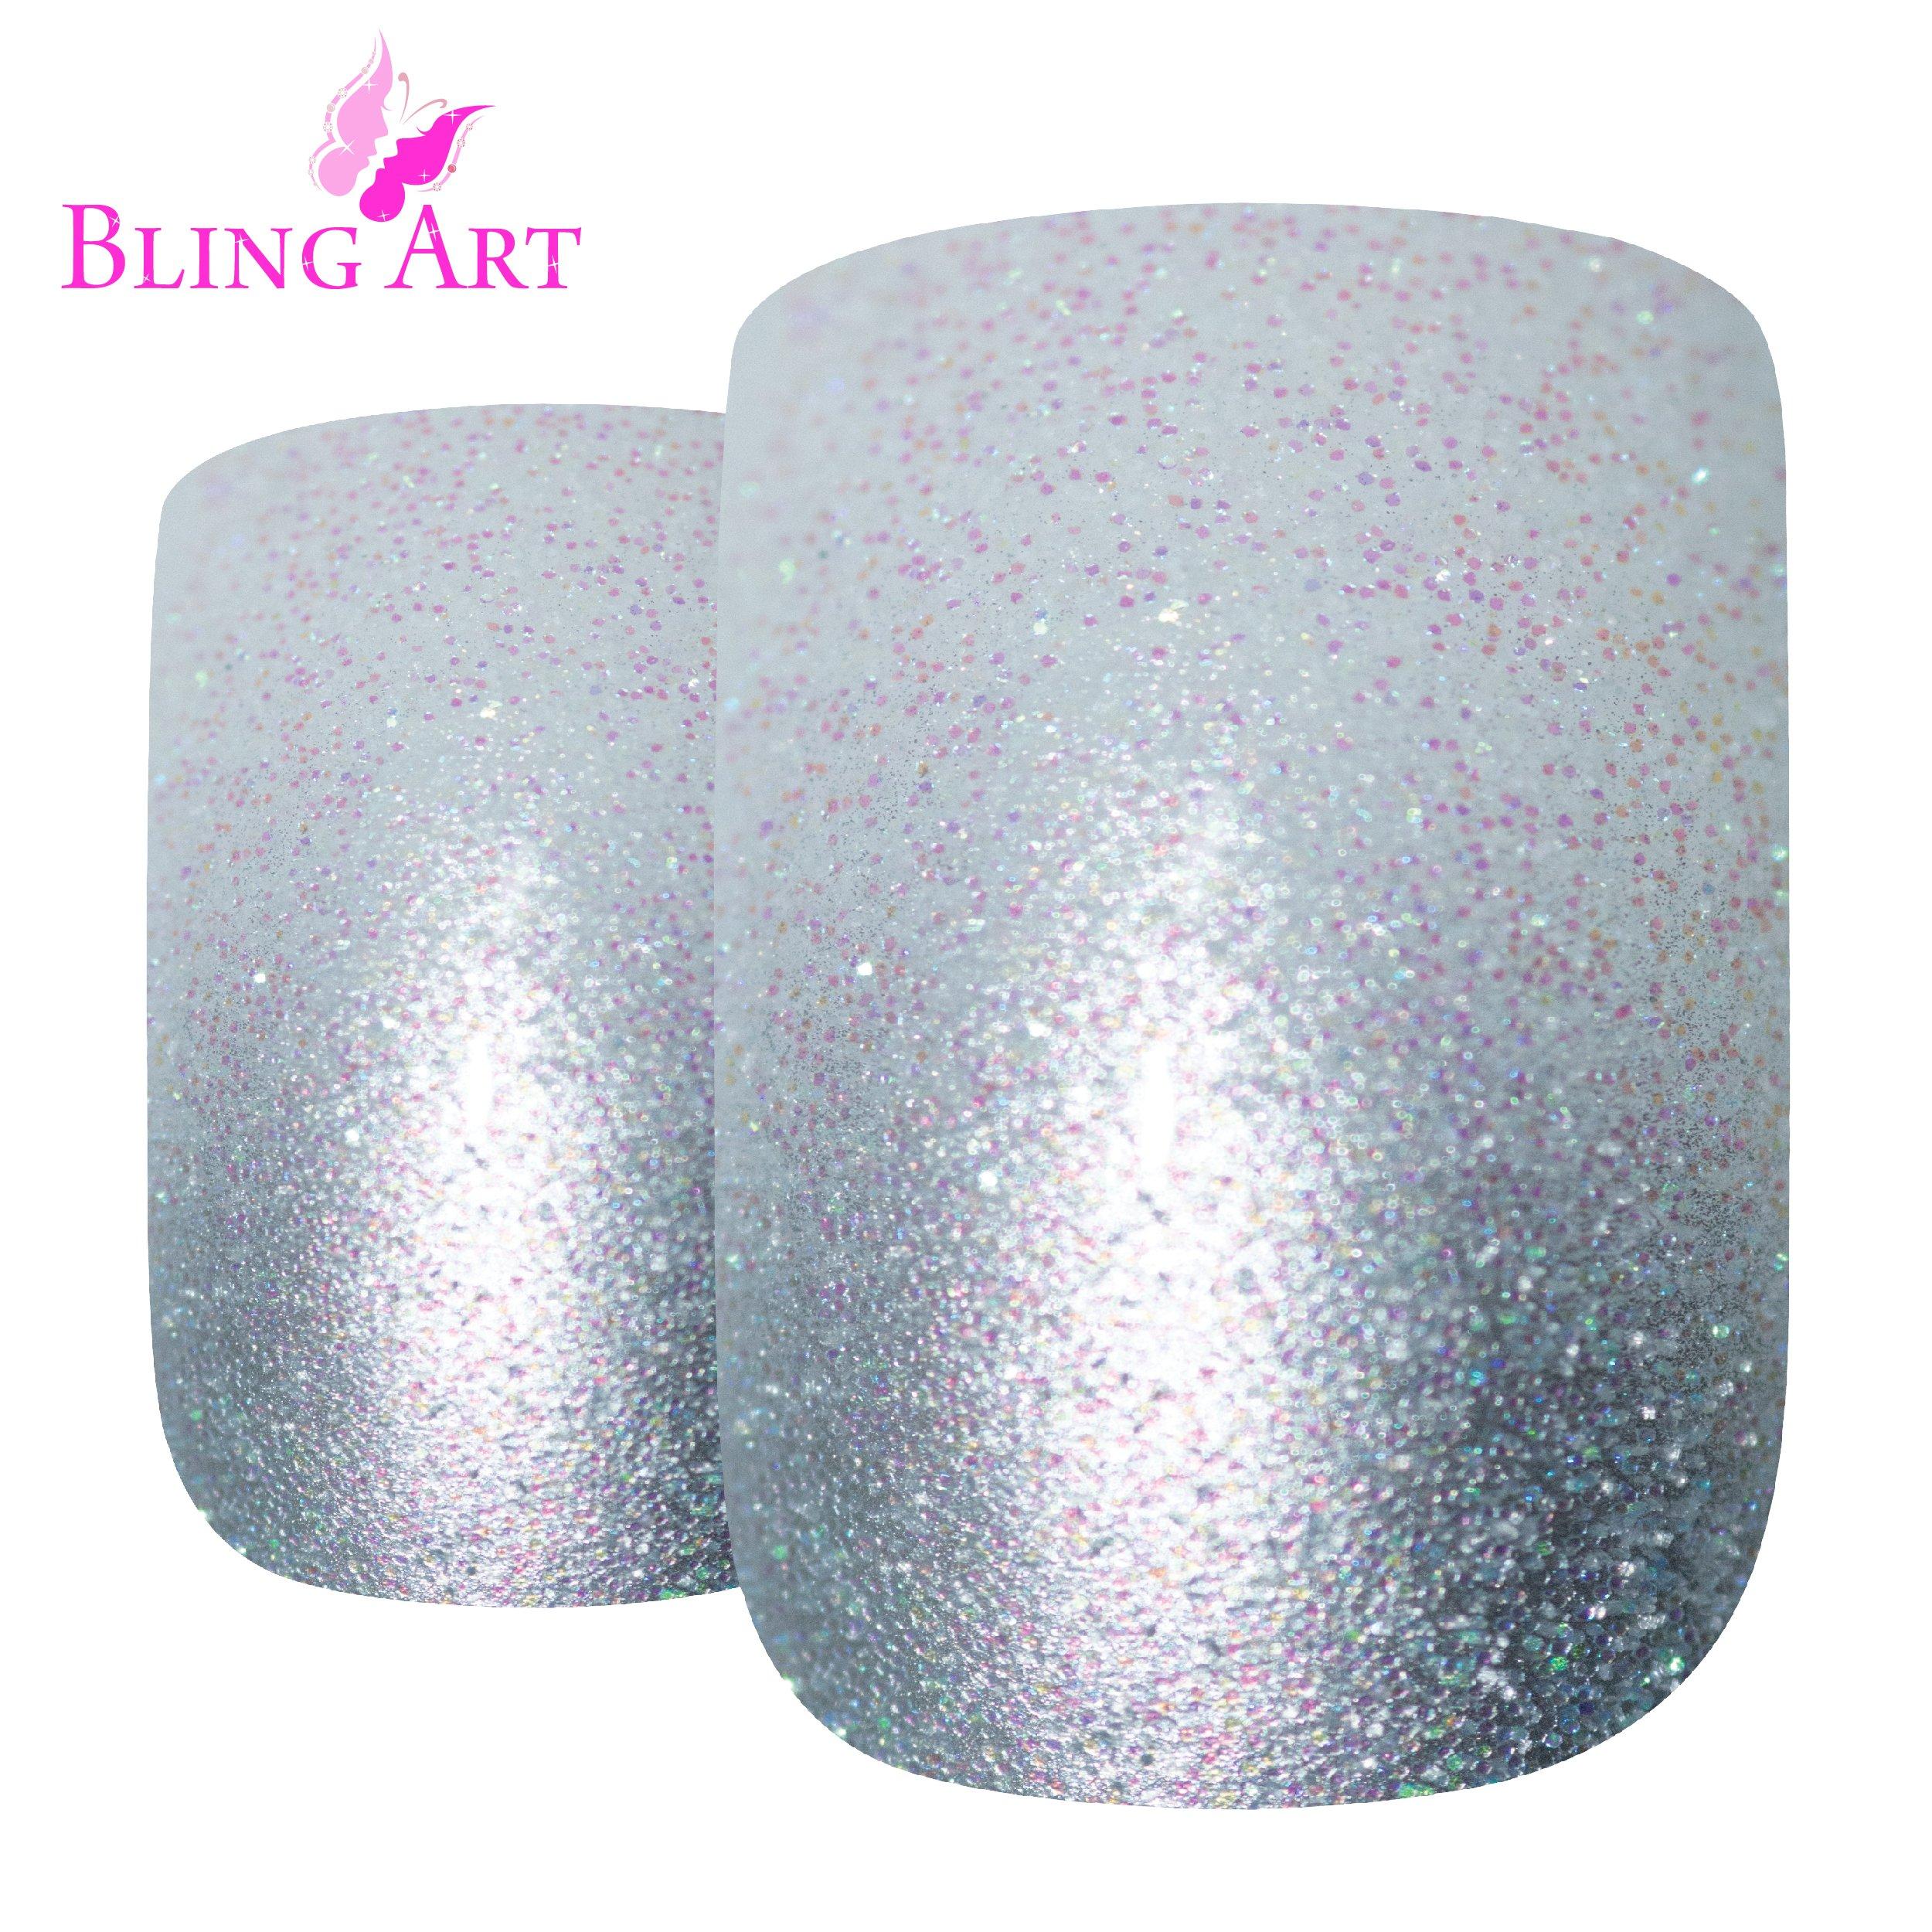 Kaned Lip Nagel Ohrringe Gl/änzende kubische Langhantel Clear Faux Diamond Helix Lippenring Stahl Farbe 6mm 2mm